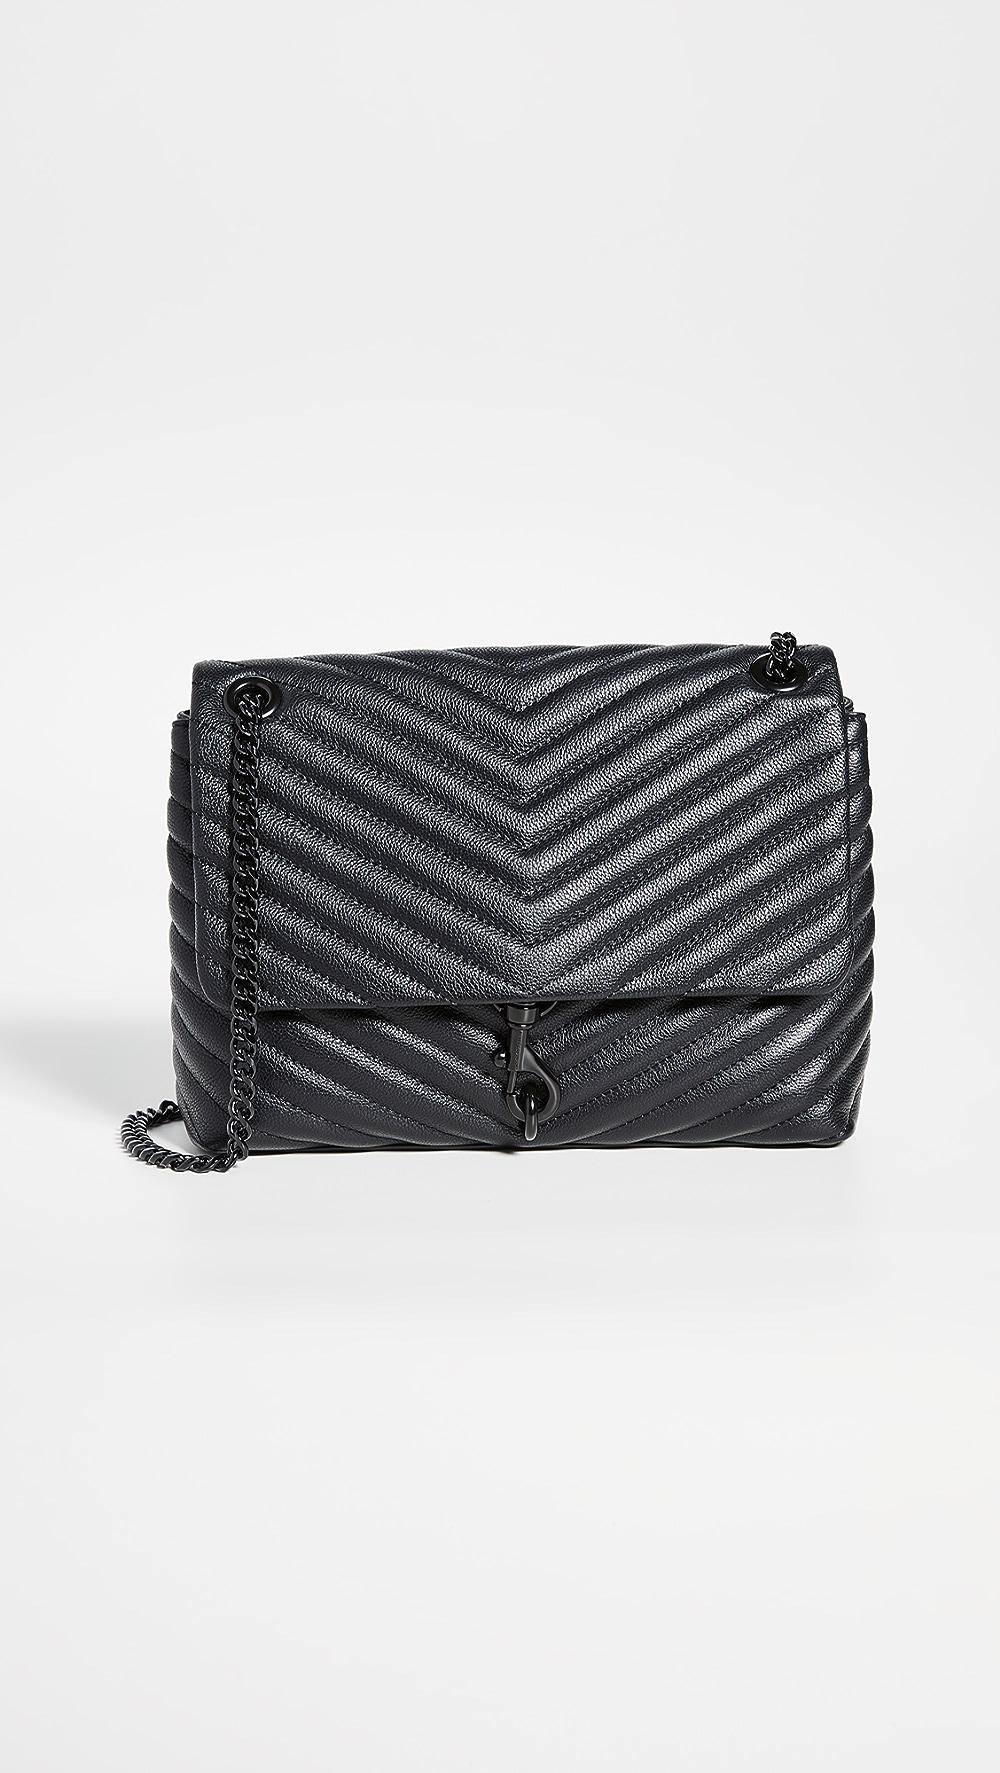 Realistic Rebecca Minkoff - Edie Flap Shoulder Bag Sale Price